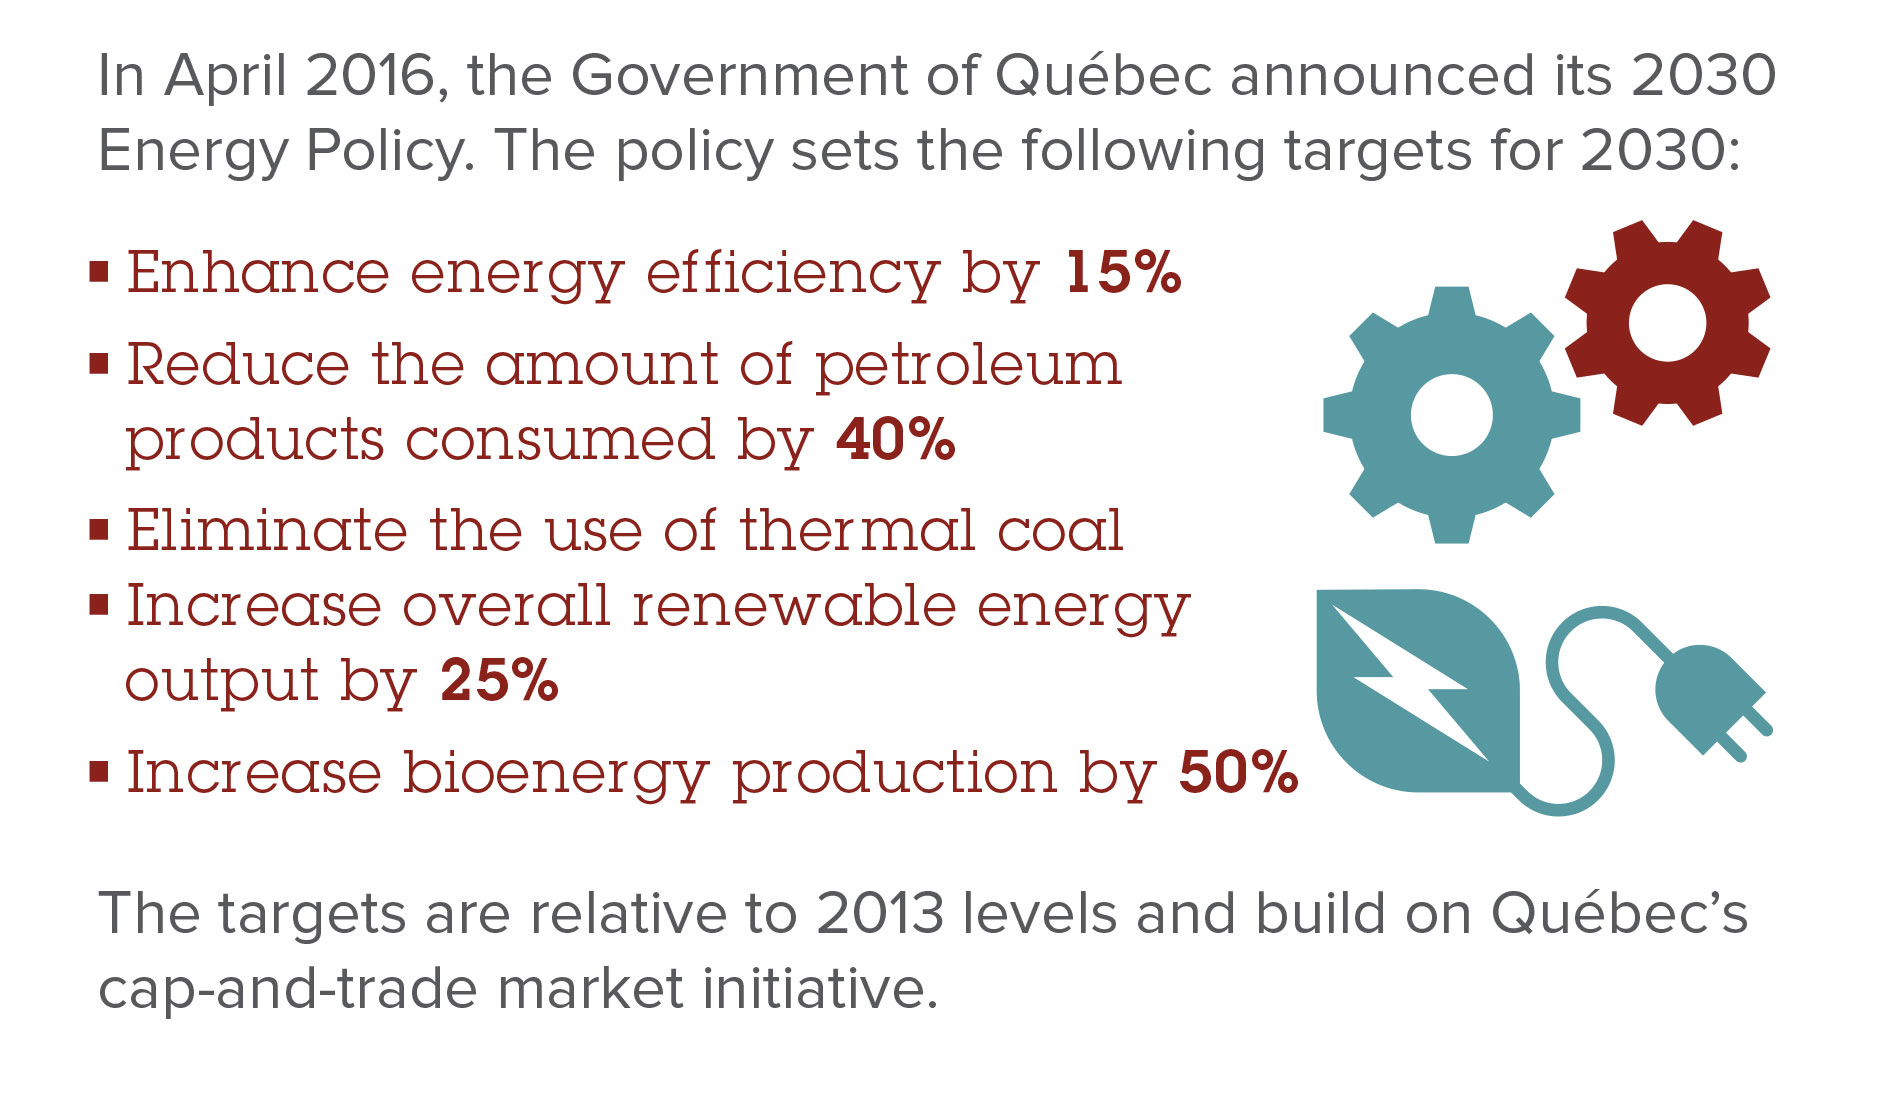 Quebec Energy Policy